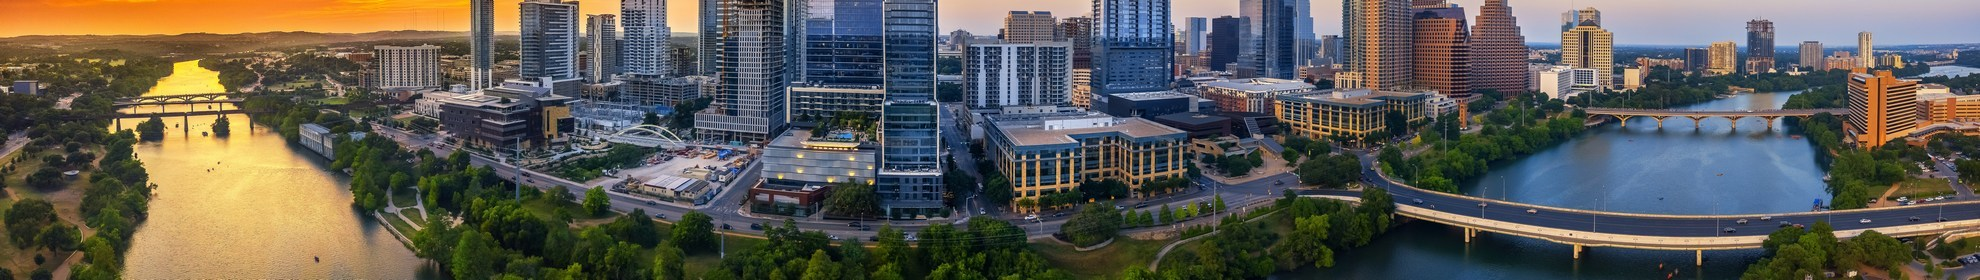 Best Western Plus Austin Airport Inn Suites Low Rates No Hidden Fees